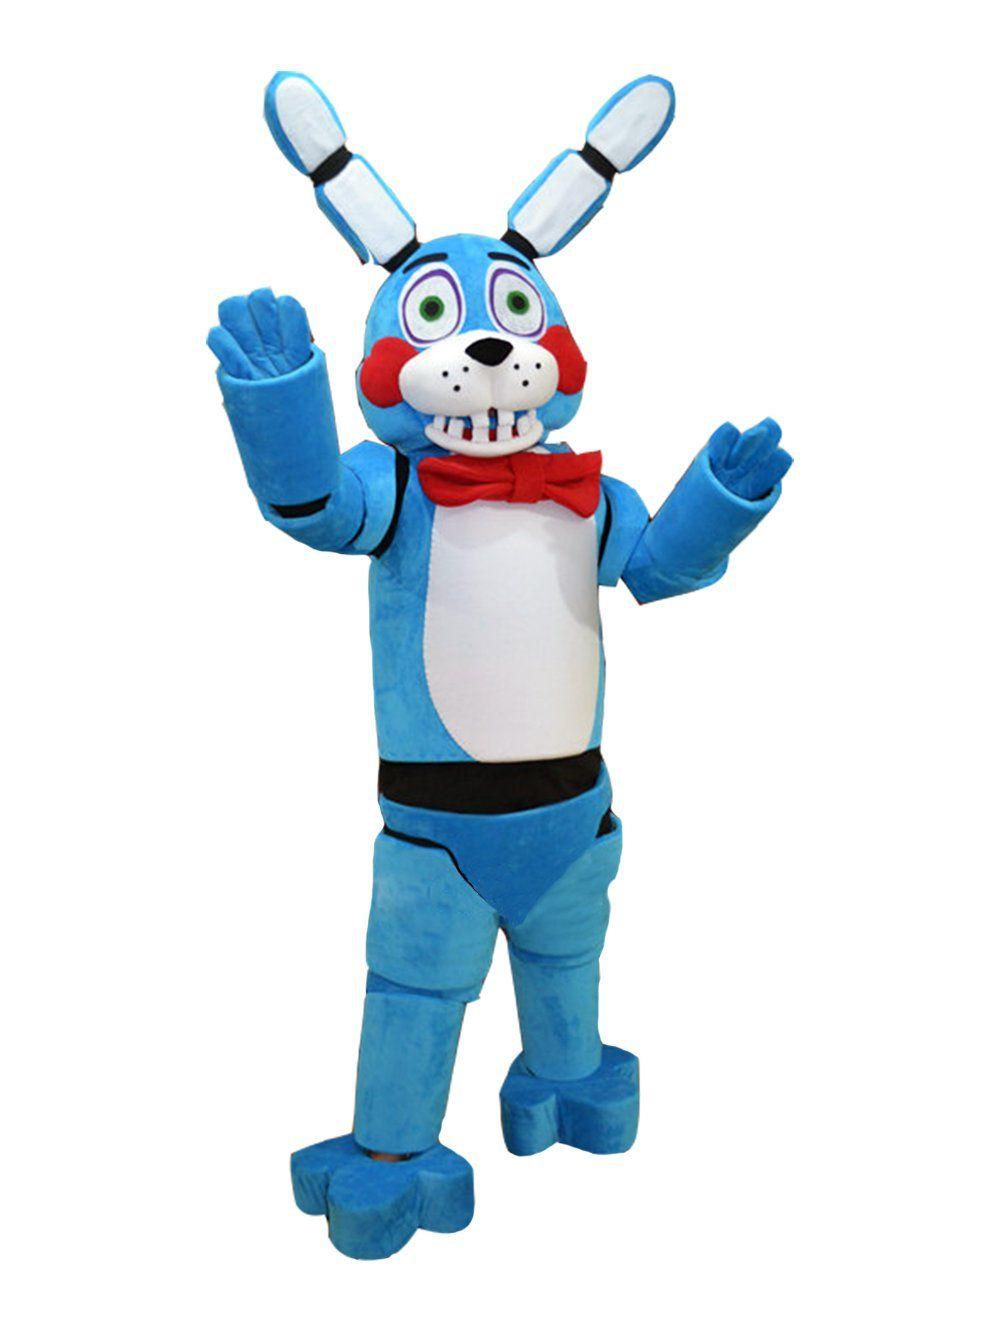 Fnaf bonnie costume for sale - Amazon Com Fnaf Toy Bonnie Mascot Costume Clothing